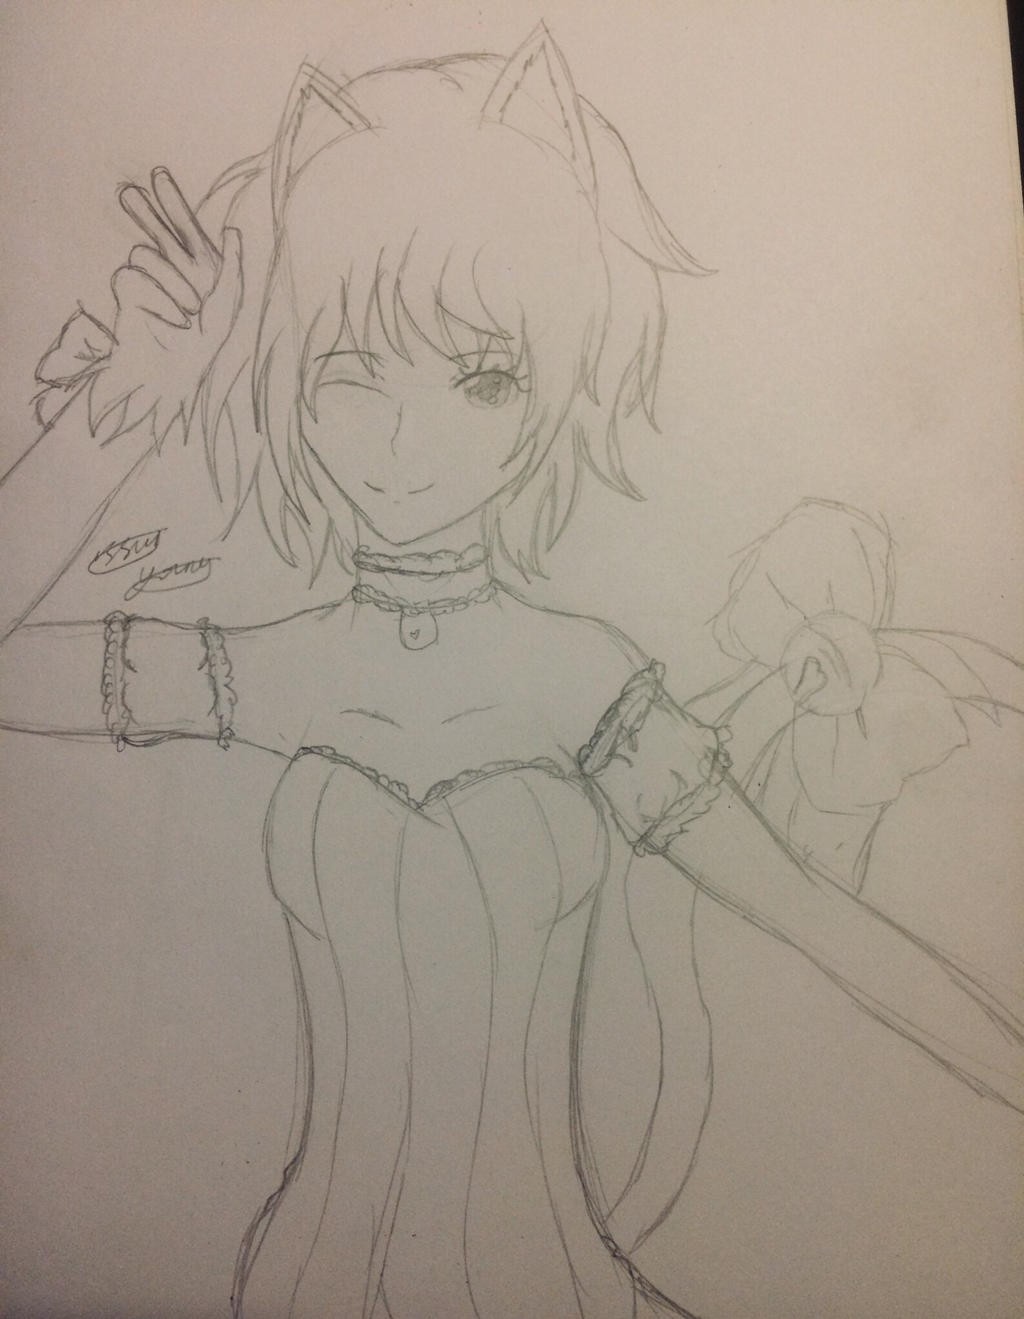 Zoey/Ichigo Mew Mew Power by epicbubble7